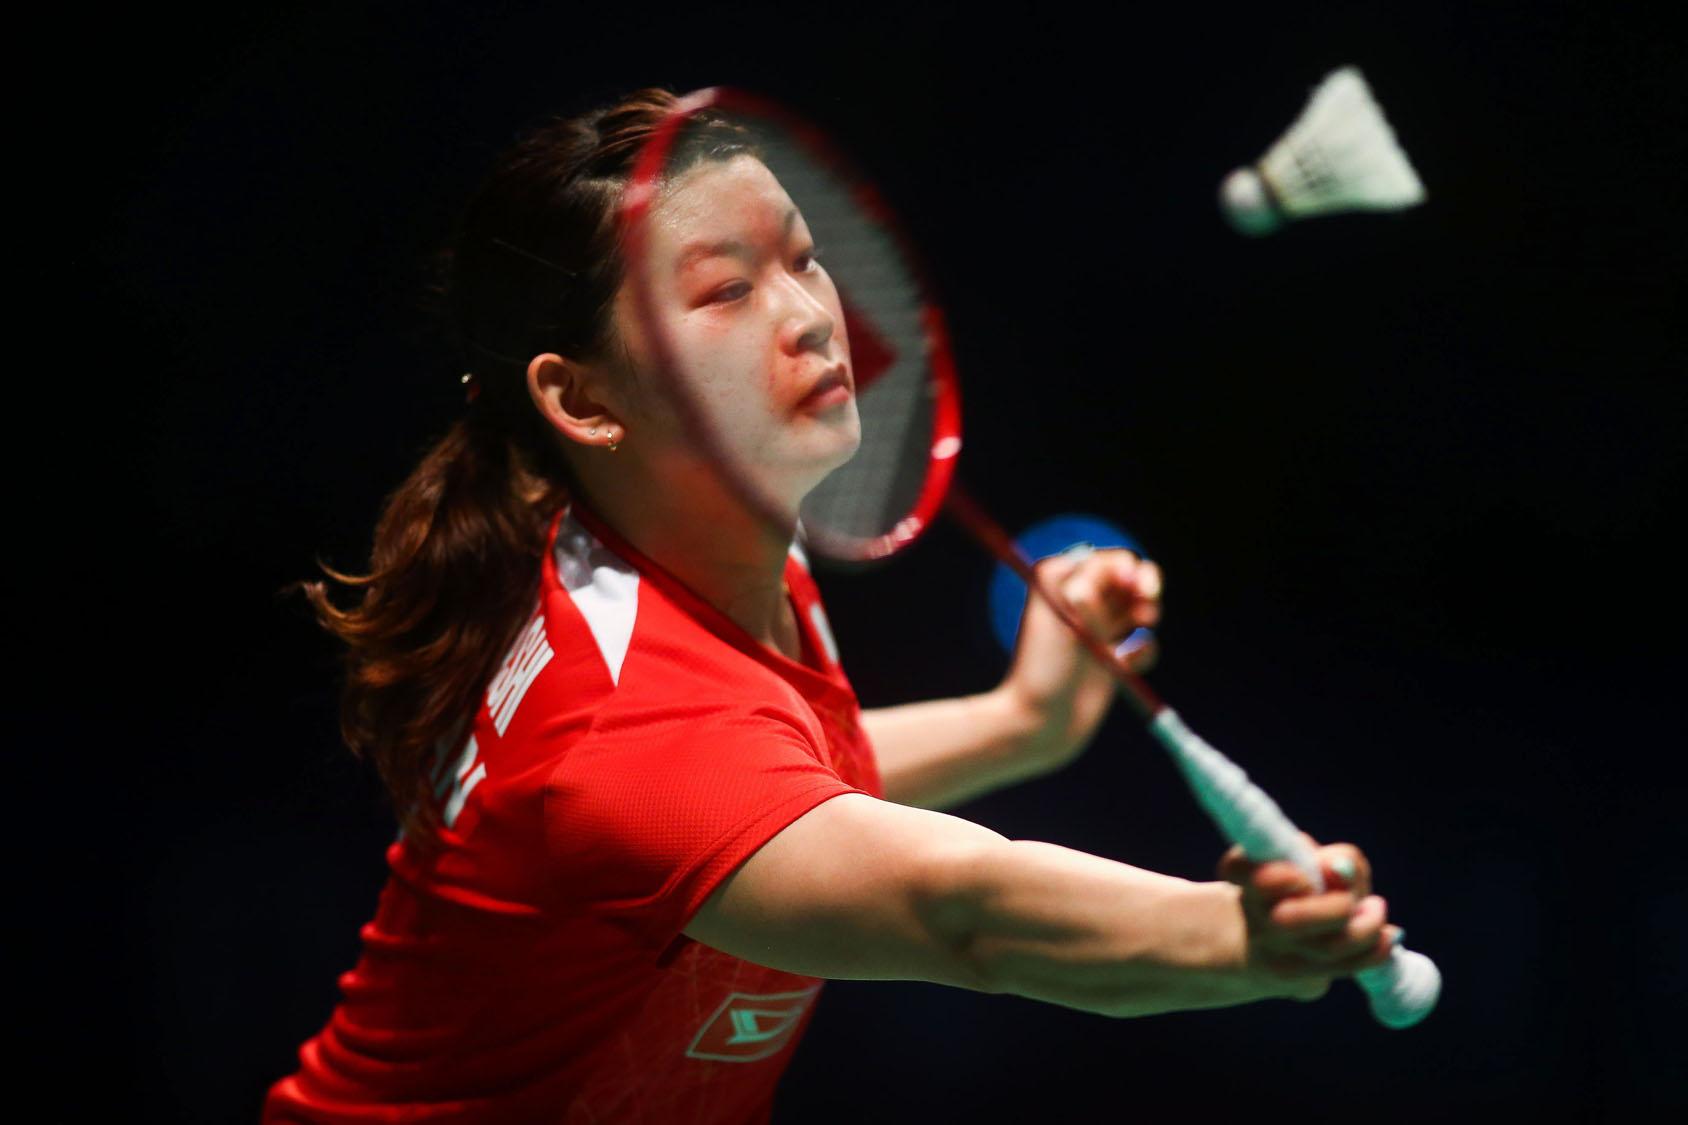 Sudirman Cup badminton championship in Australia